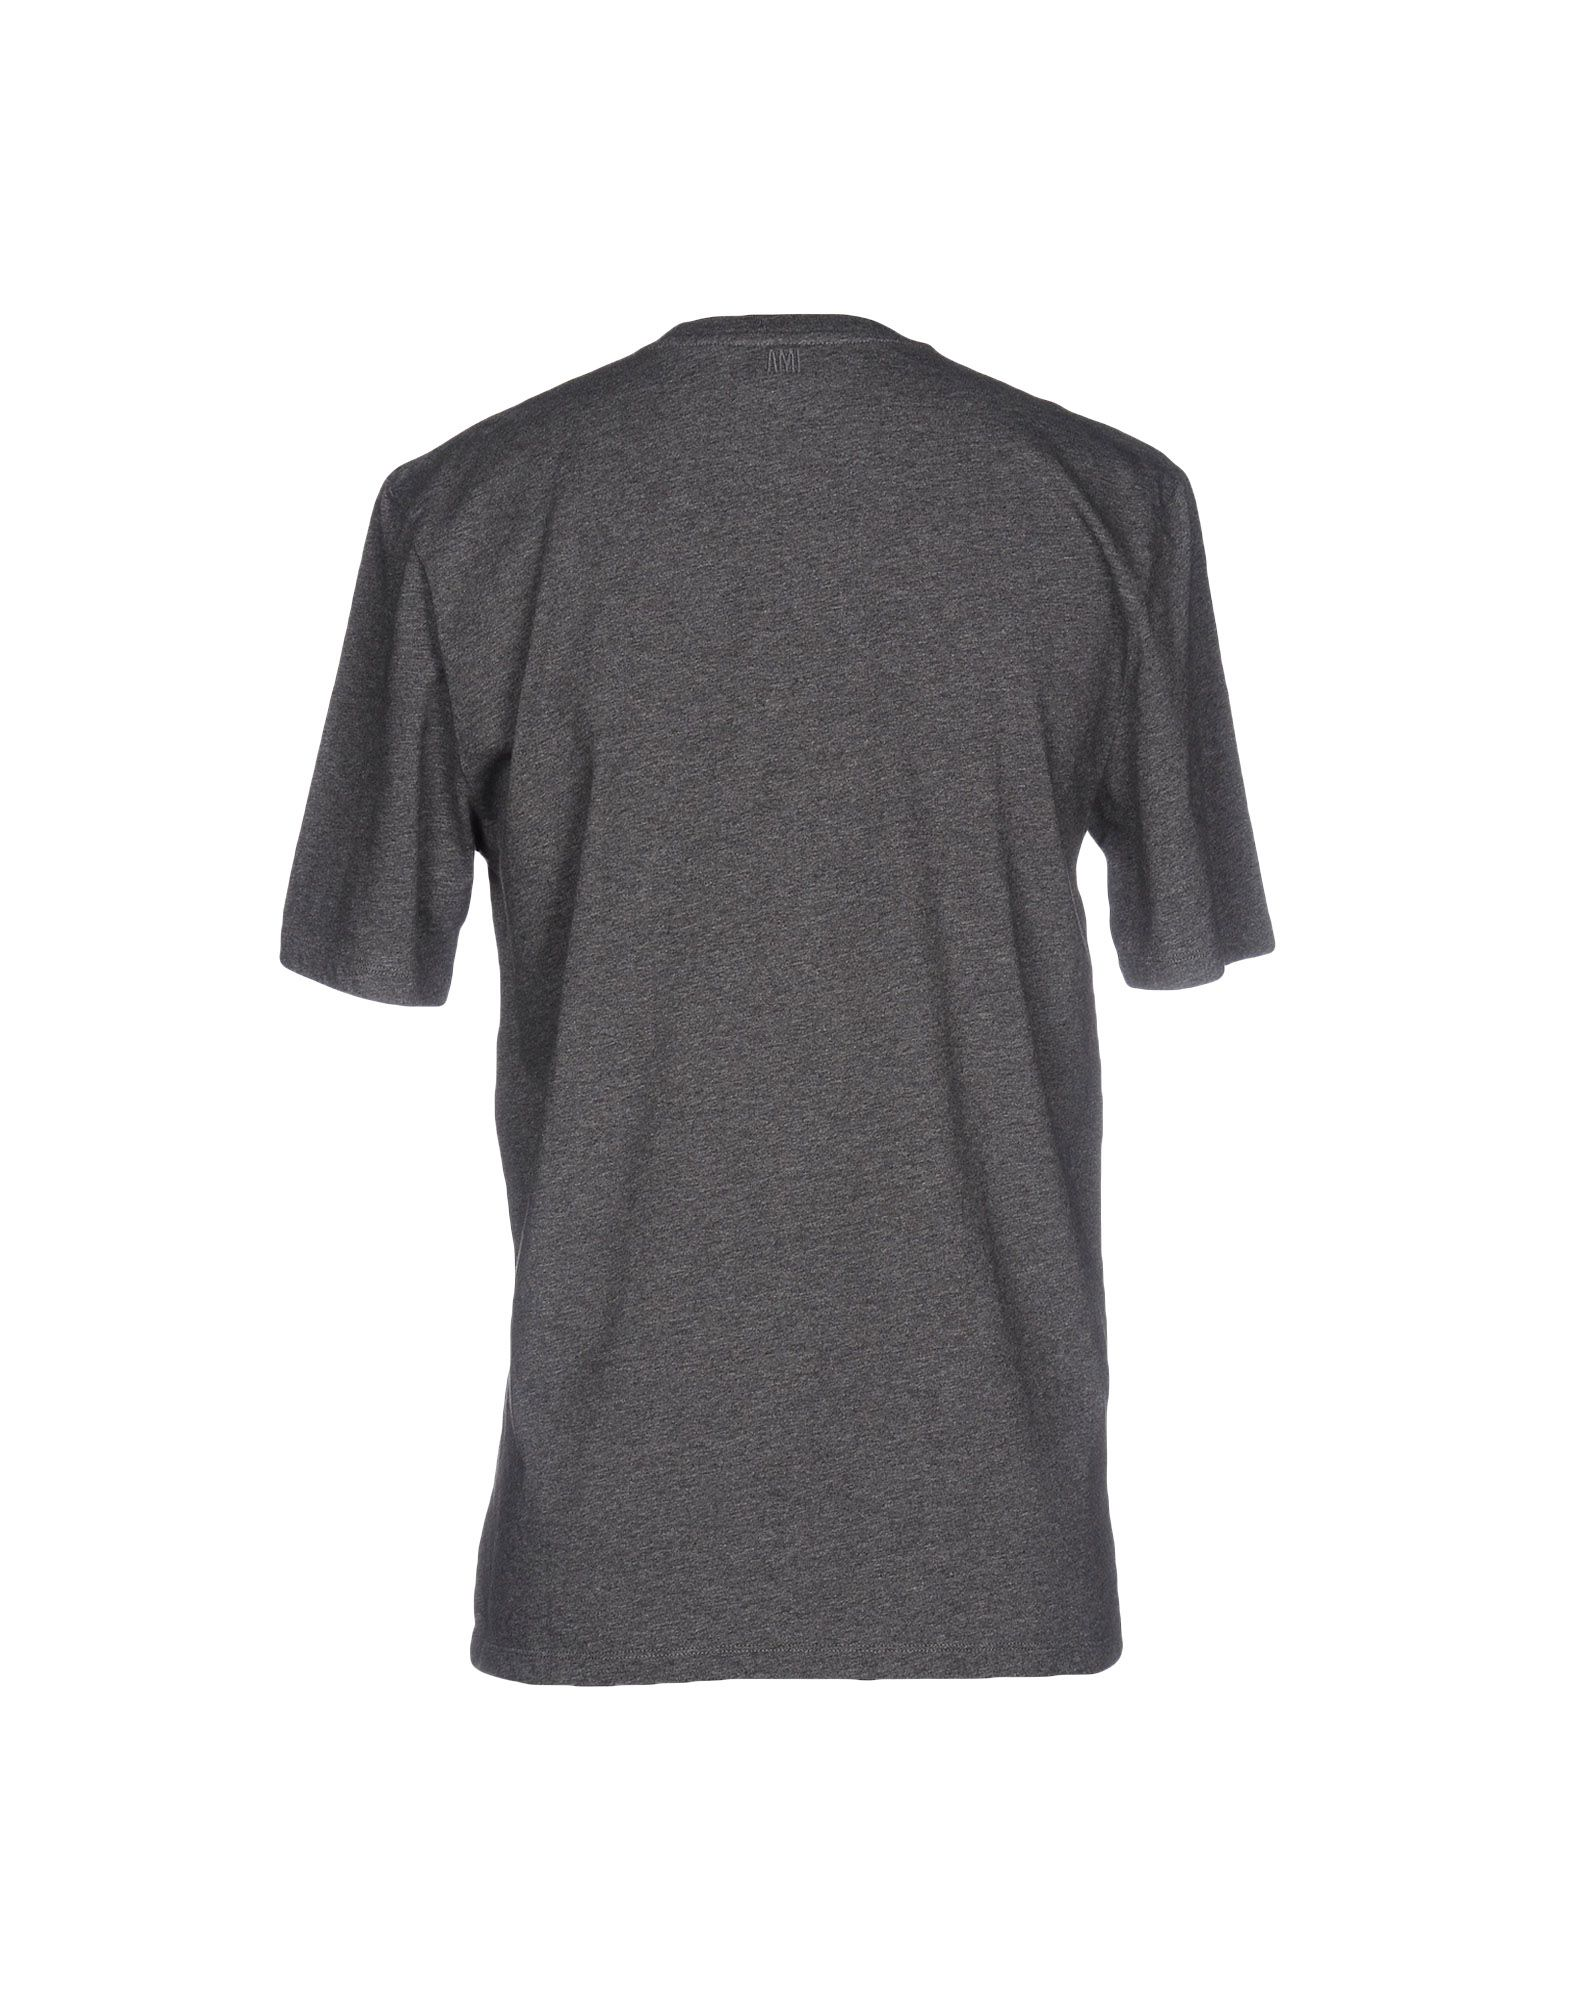 T-Shirt Ami Alexandre Mattiussi Uomo 12006403BO - 12006403BO Uomo 6eb87f